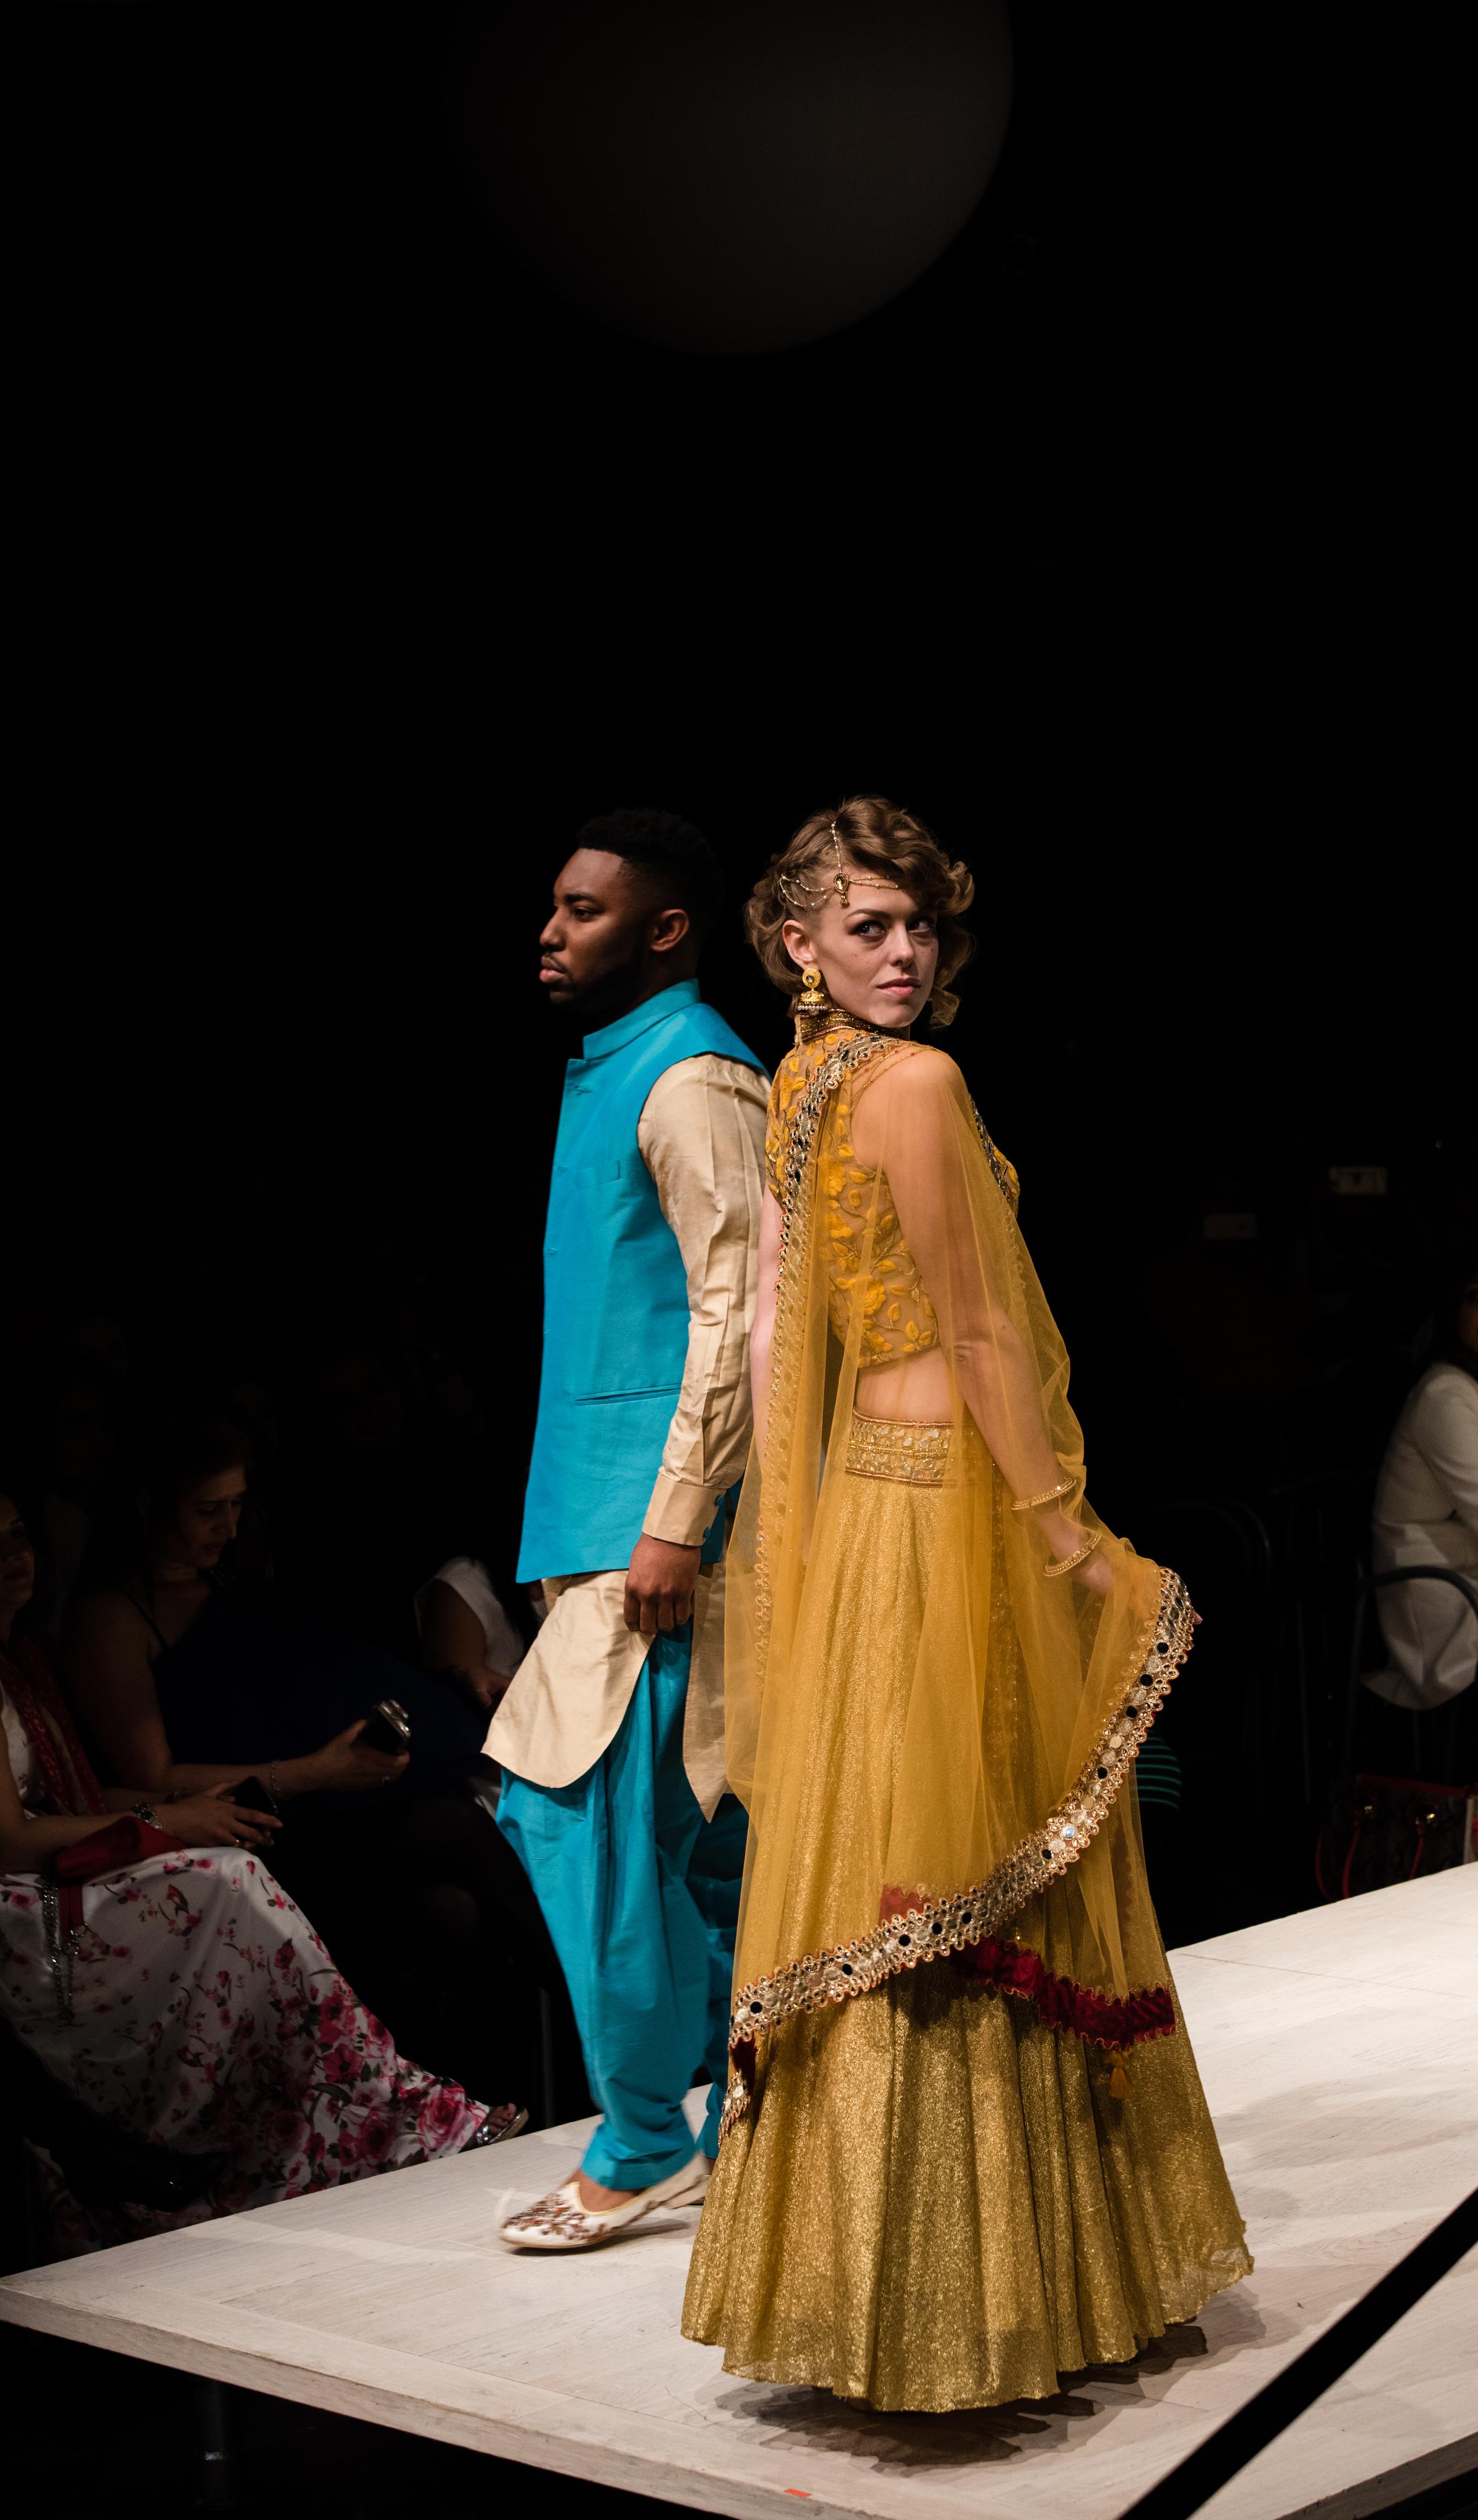 Sher Khan Niazi-WCFW-Designerz Den-3518.jpg